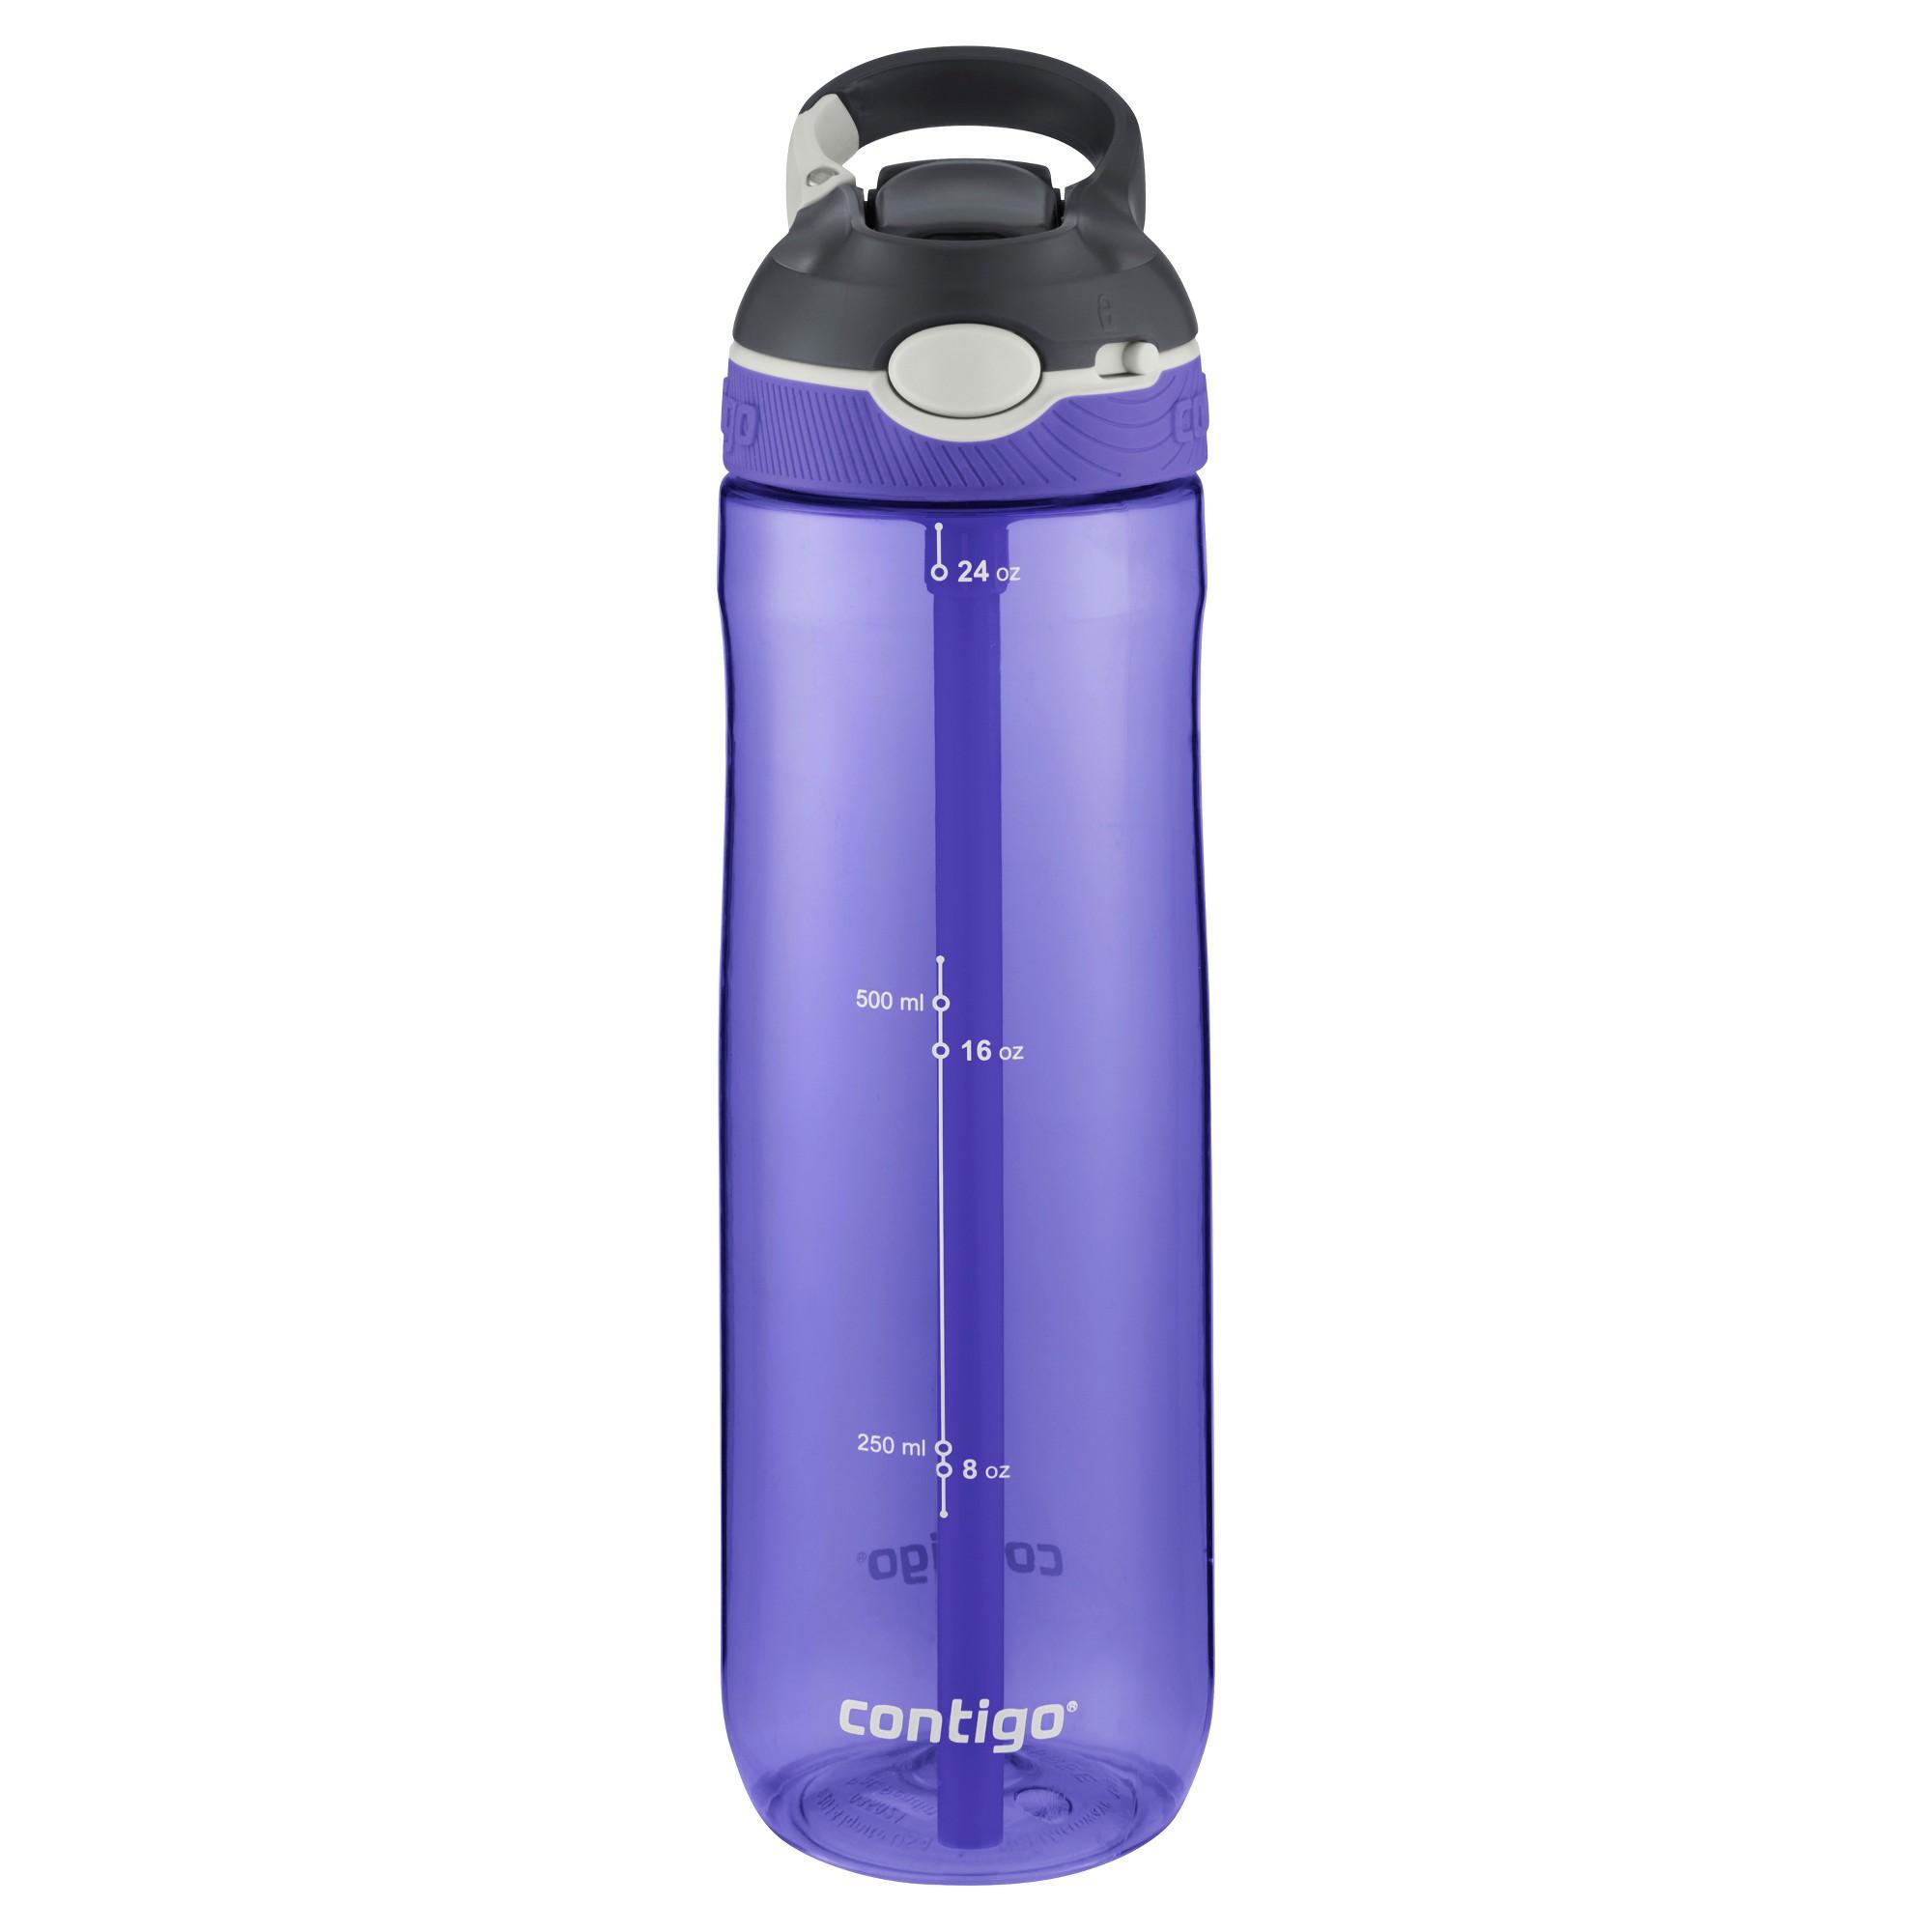 Contigo 24oz Autospout Straw Ashland Hydration Bottle